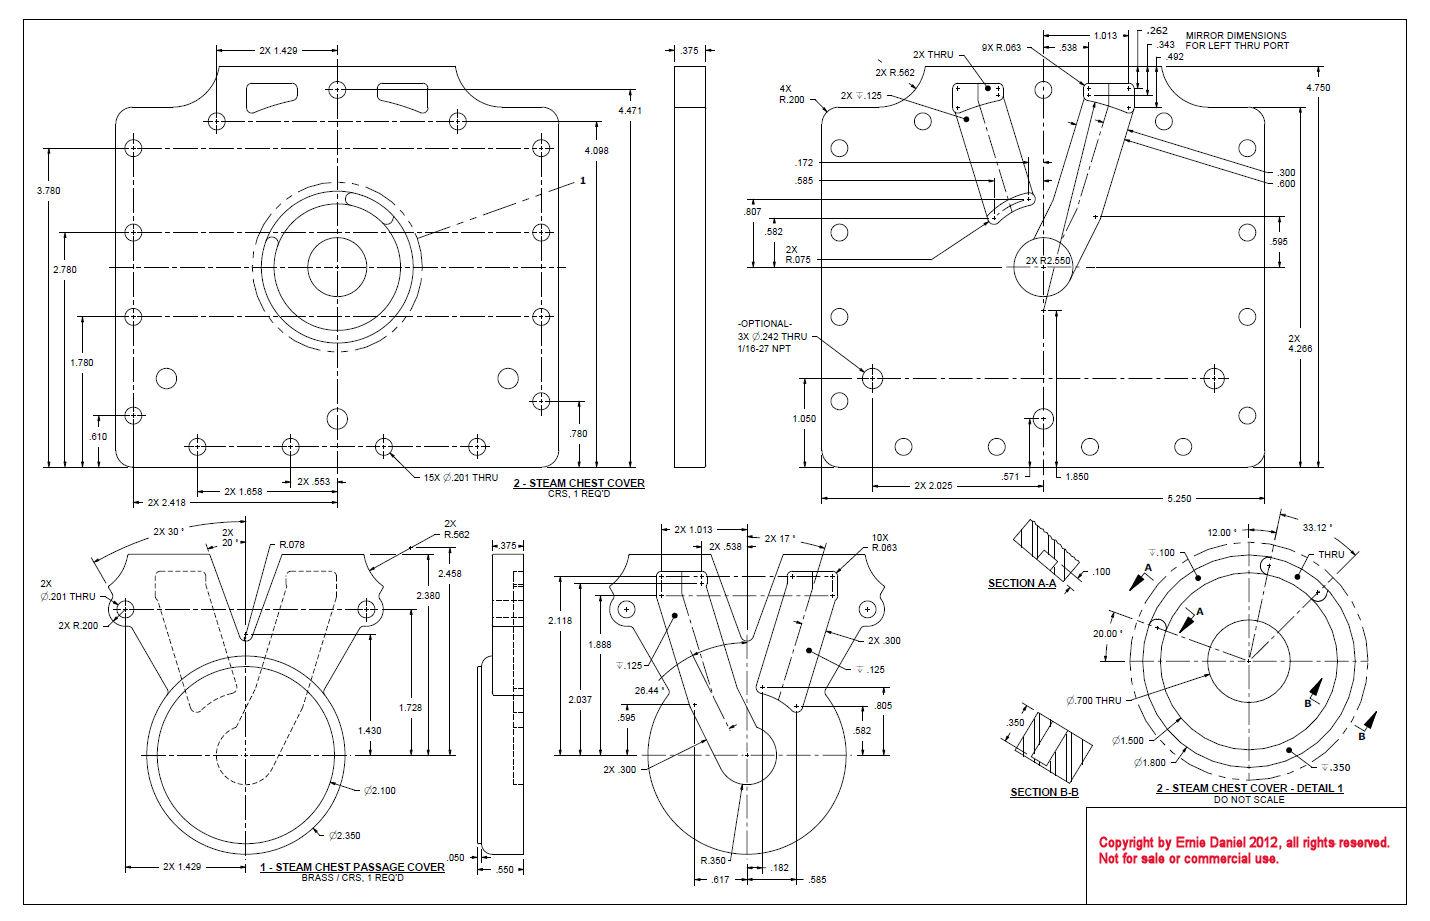 Dake-Ernie-Daniel-Page-11.jpg